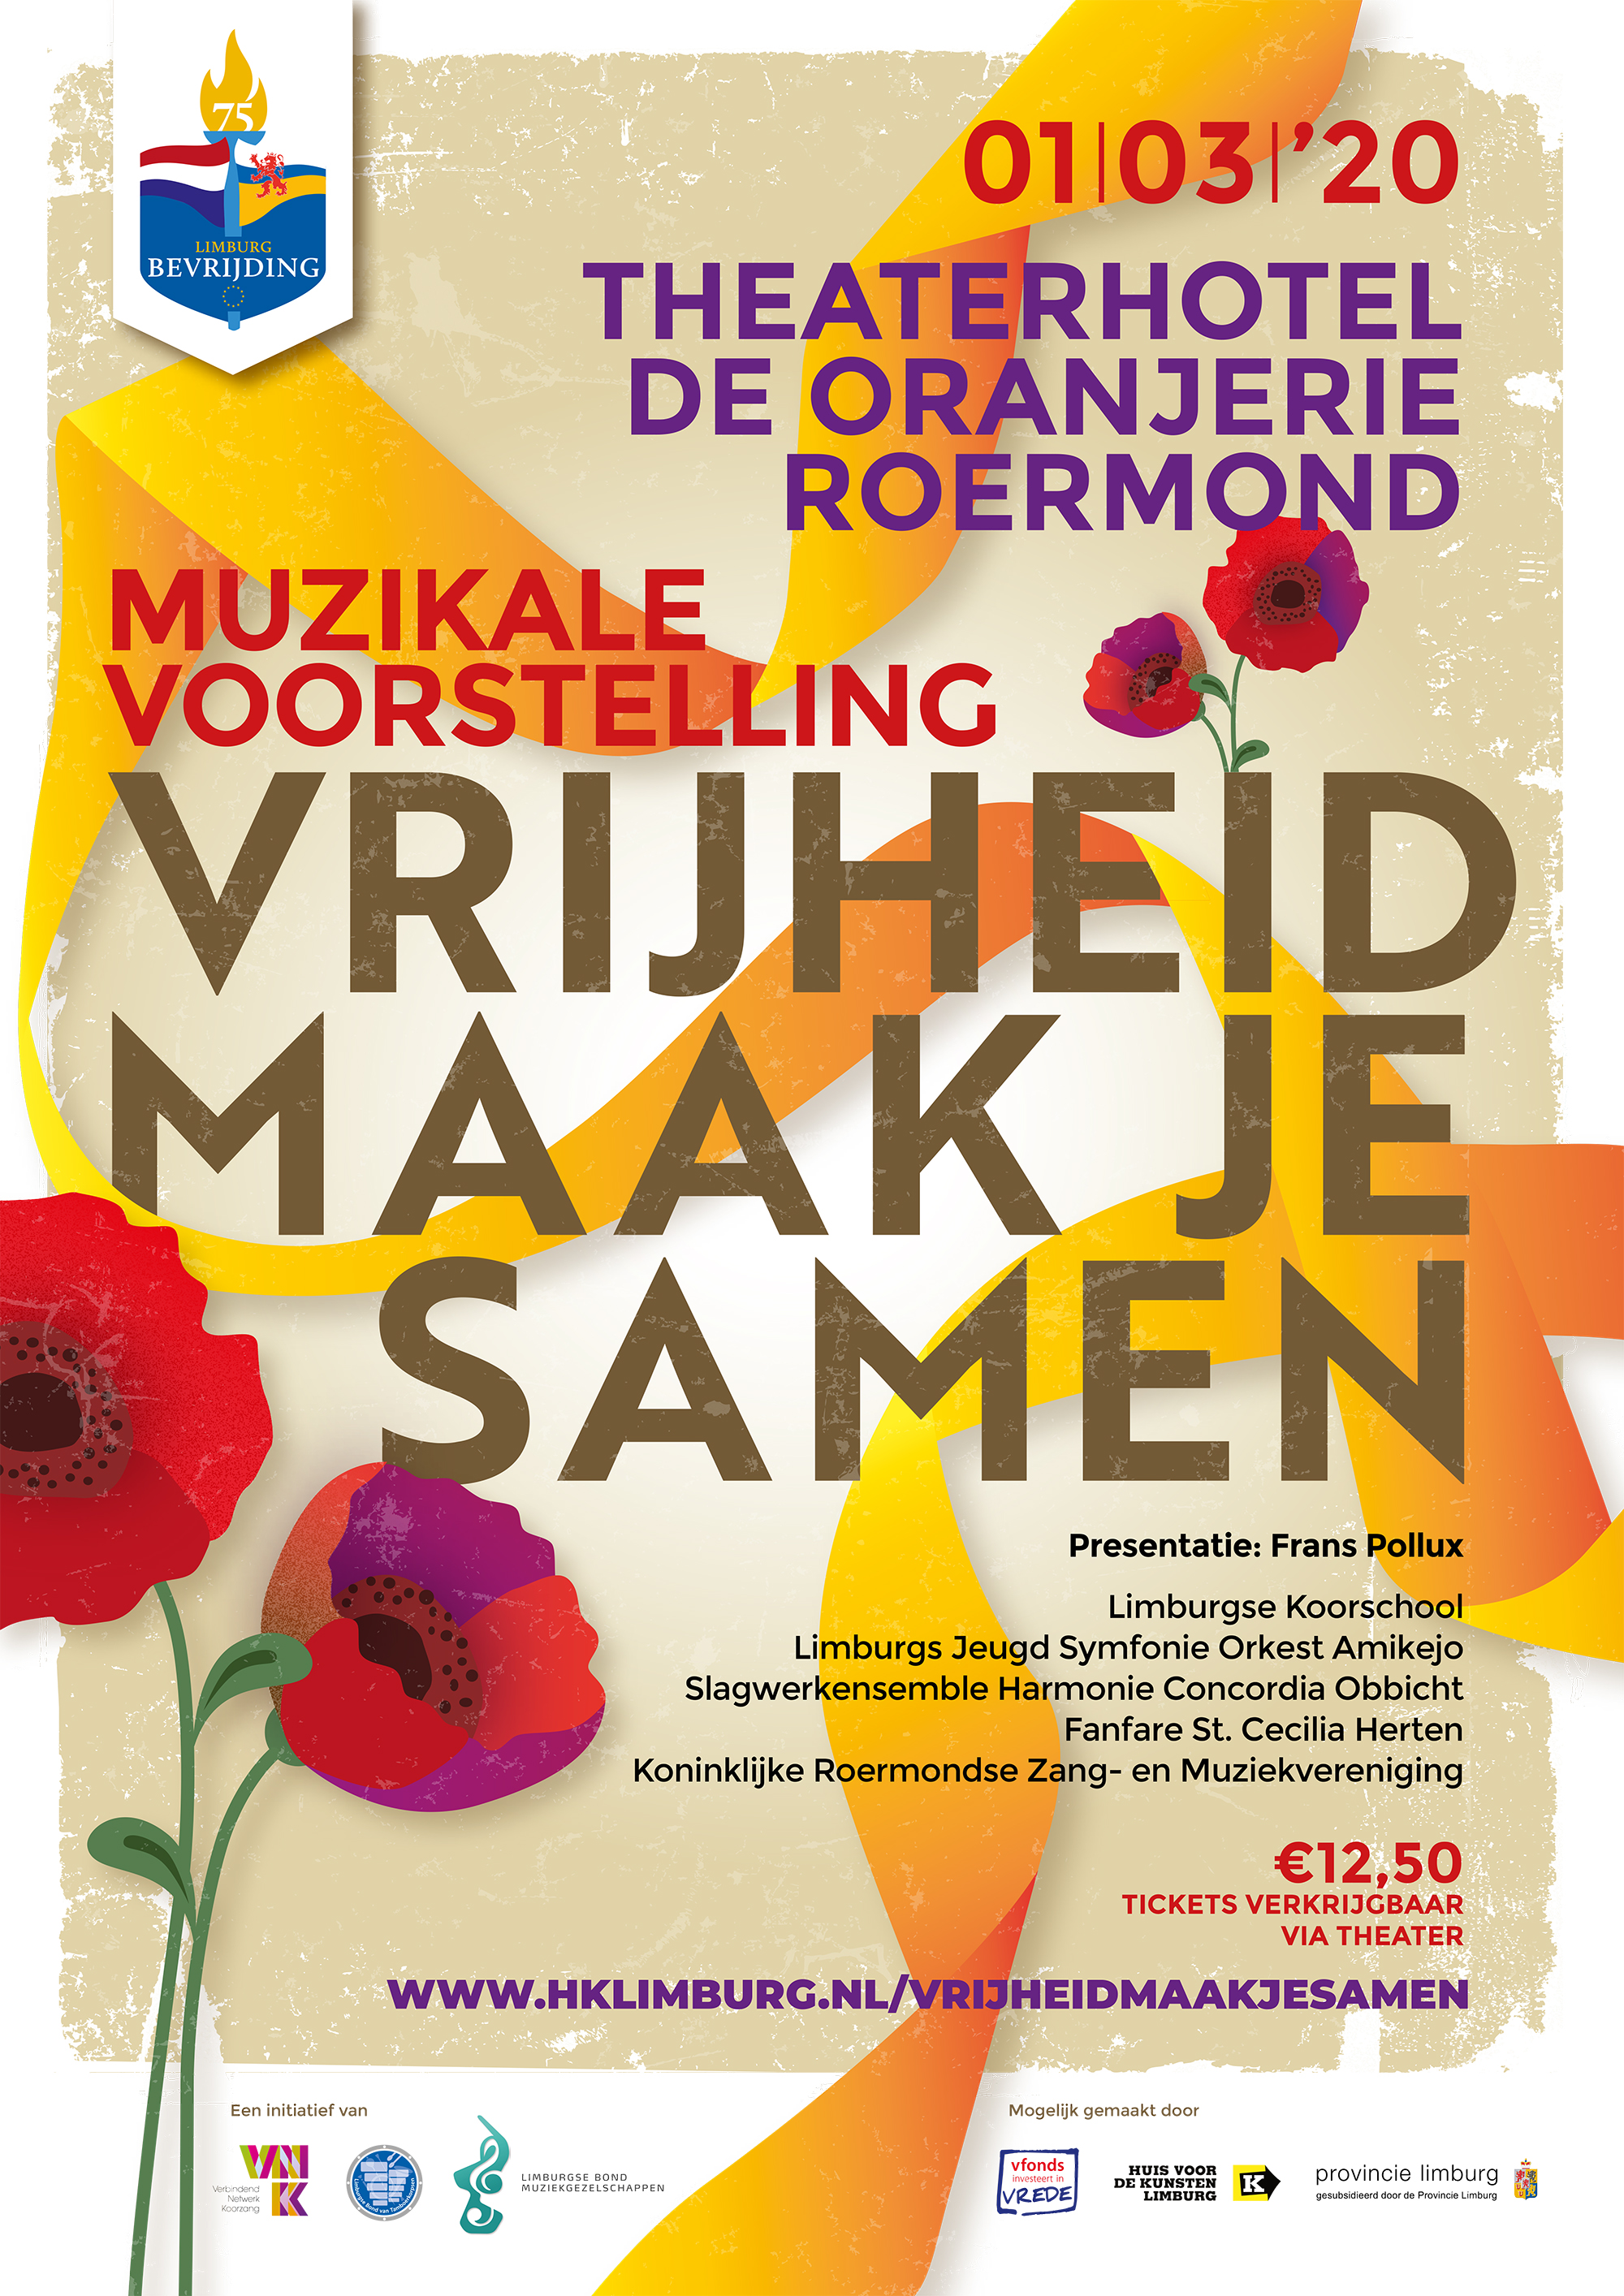 1-1 Vrijheid Maak je Samen Roermond 1 maart